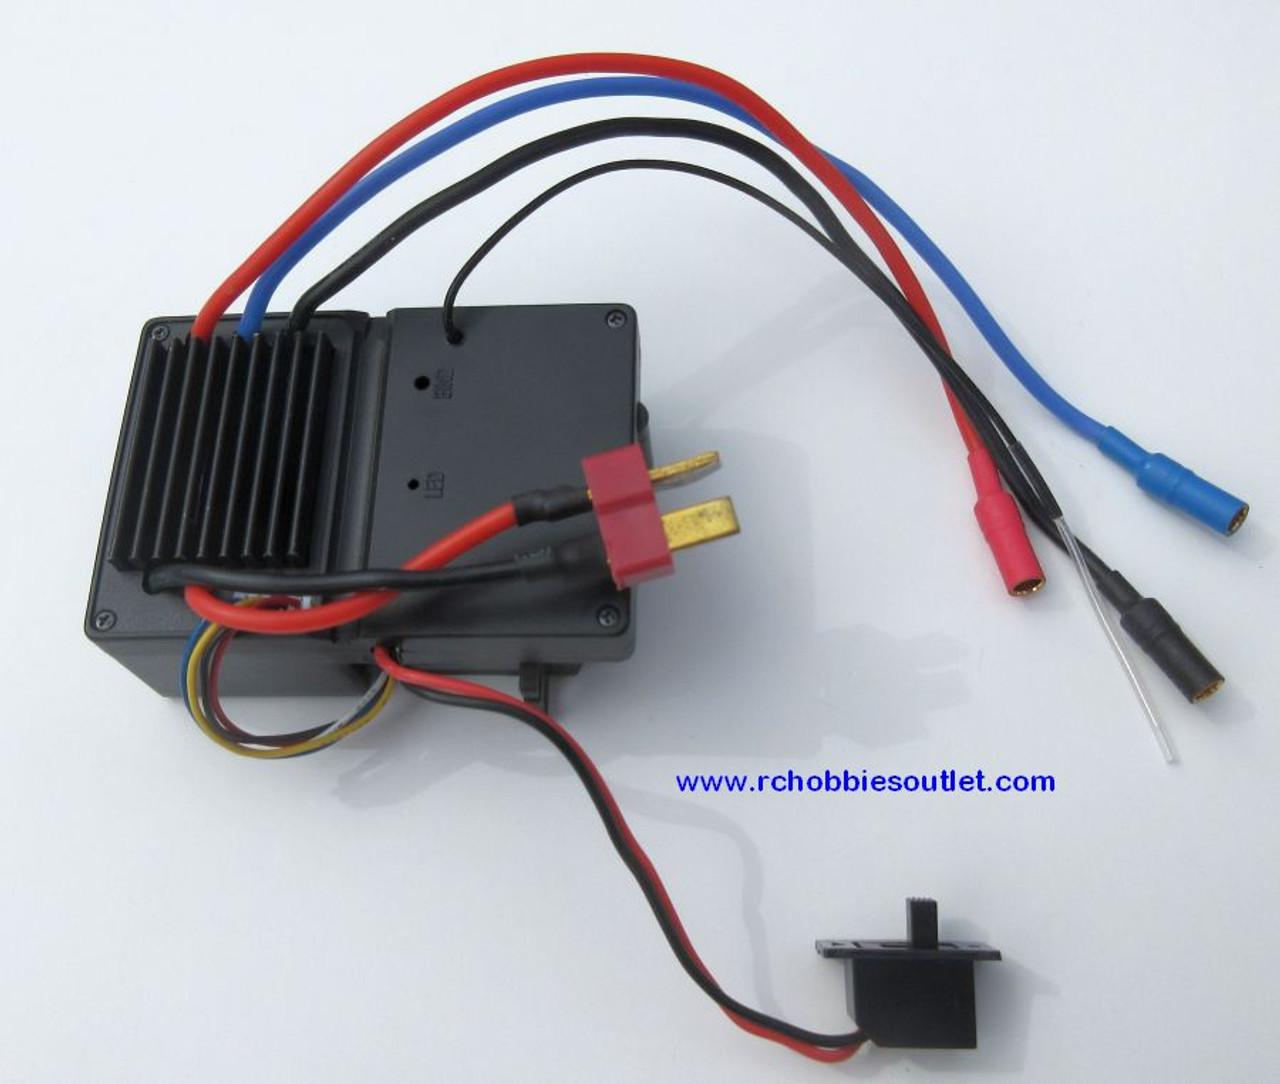 50648  Brushless ESC Servo Receiver Module for 1/12 Scale HSP Brushless Buggy